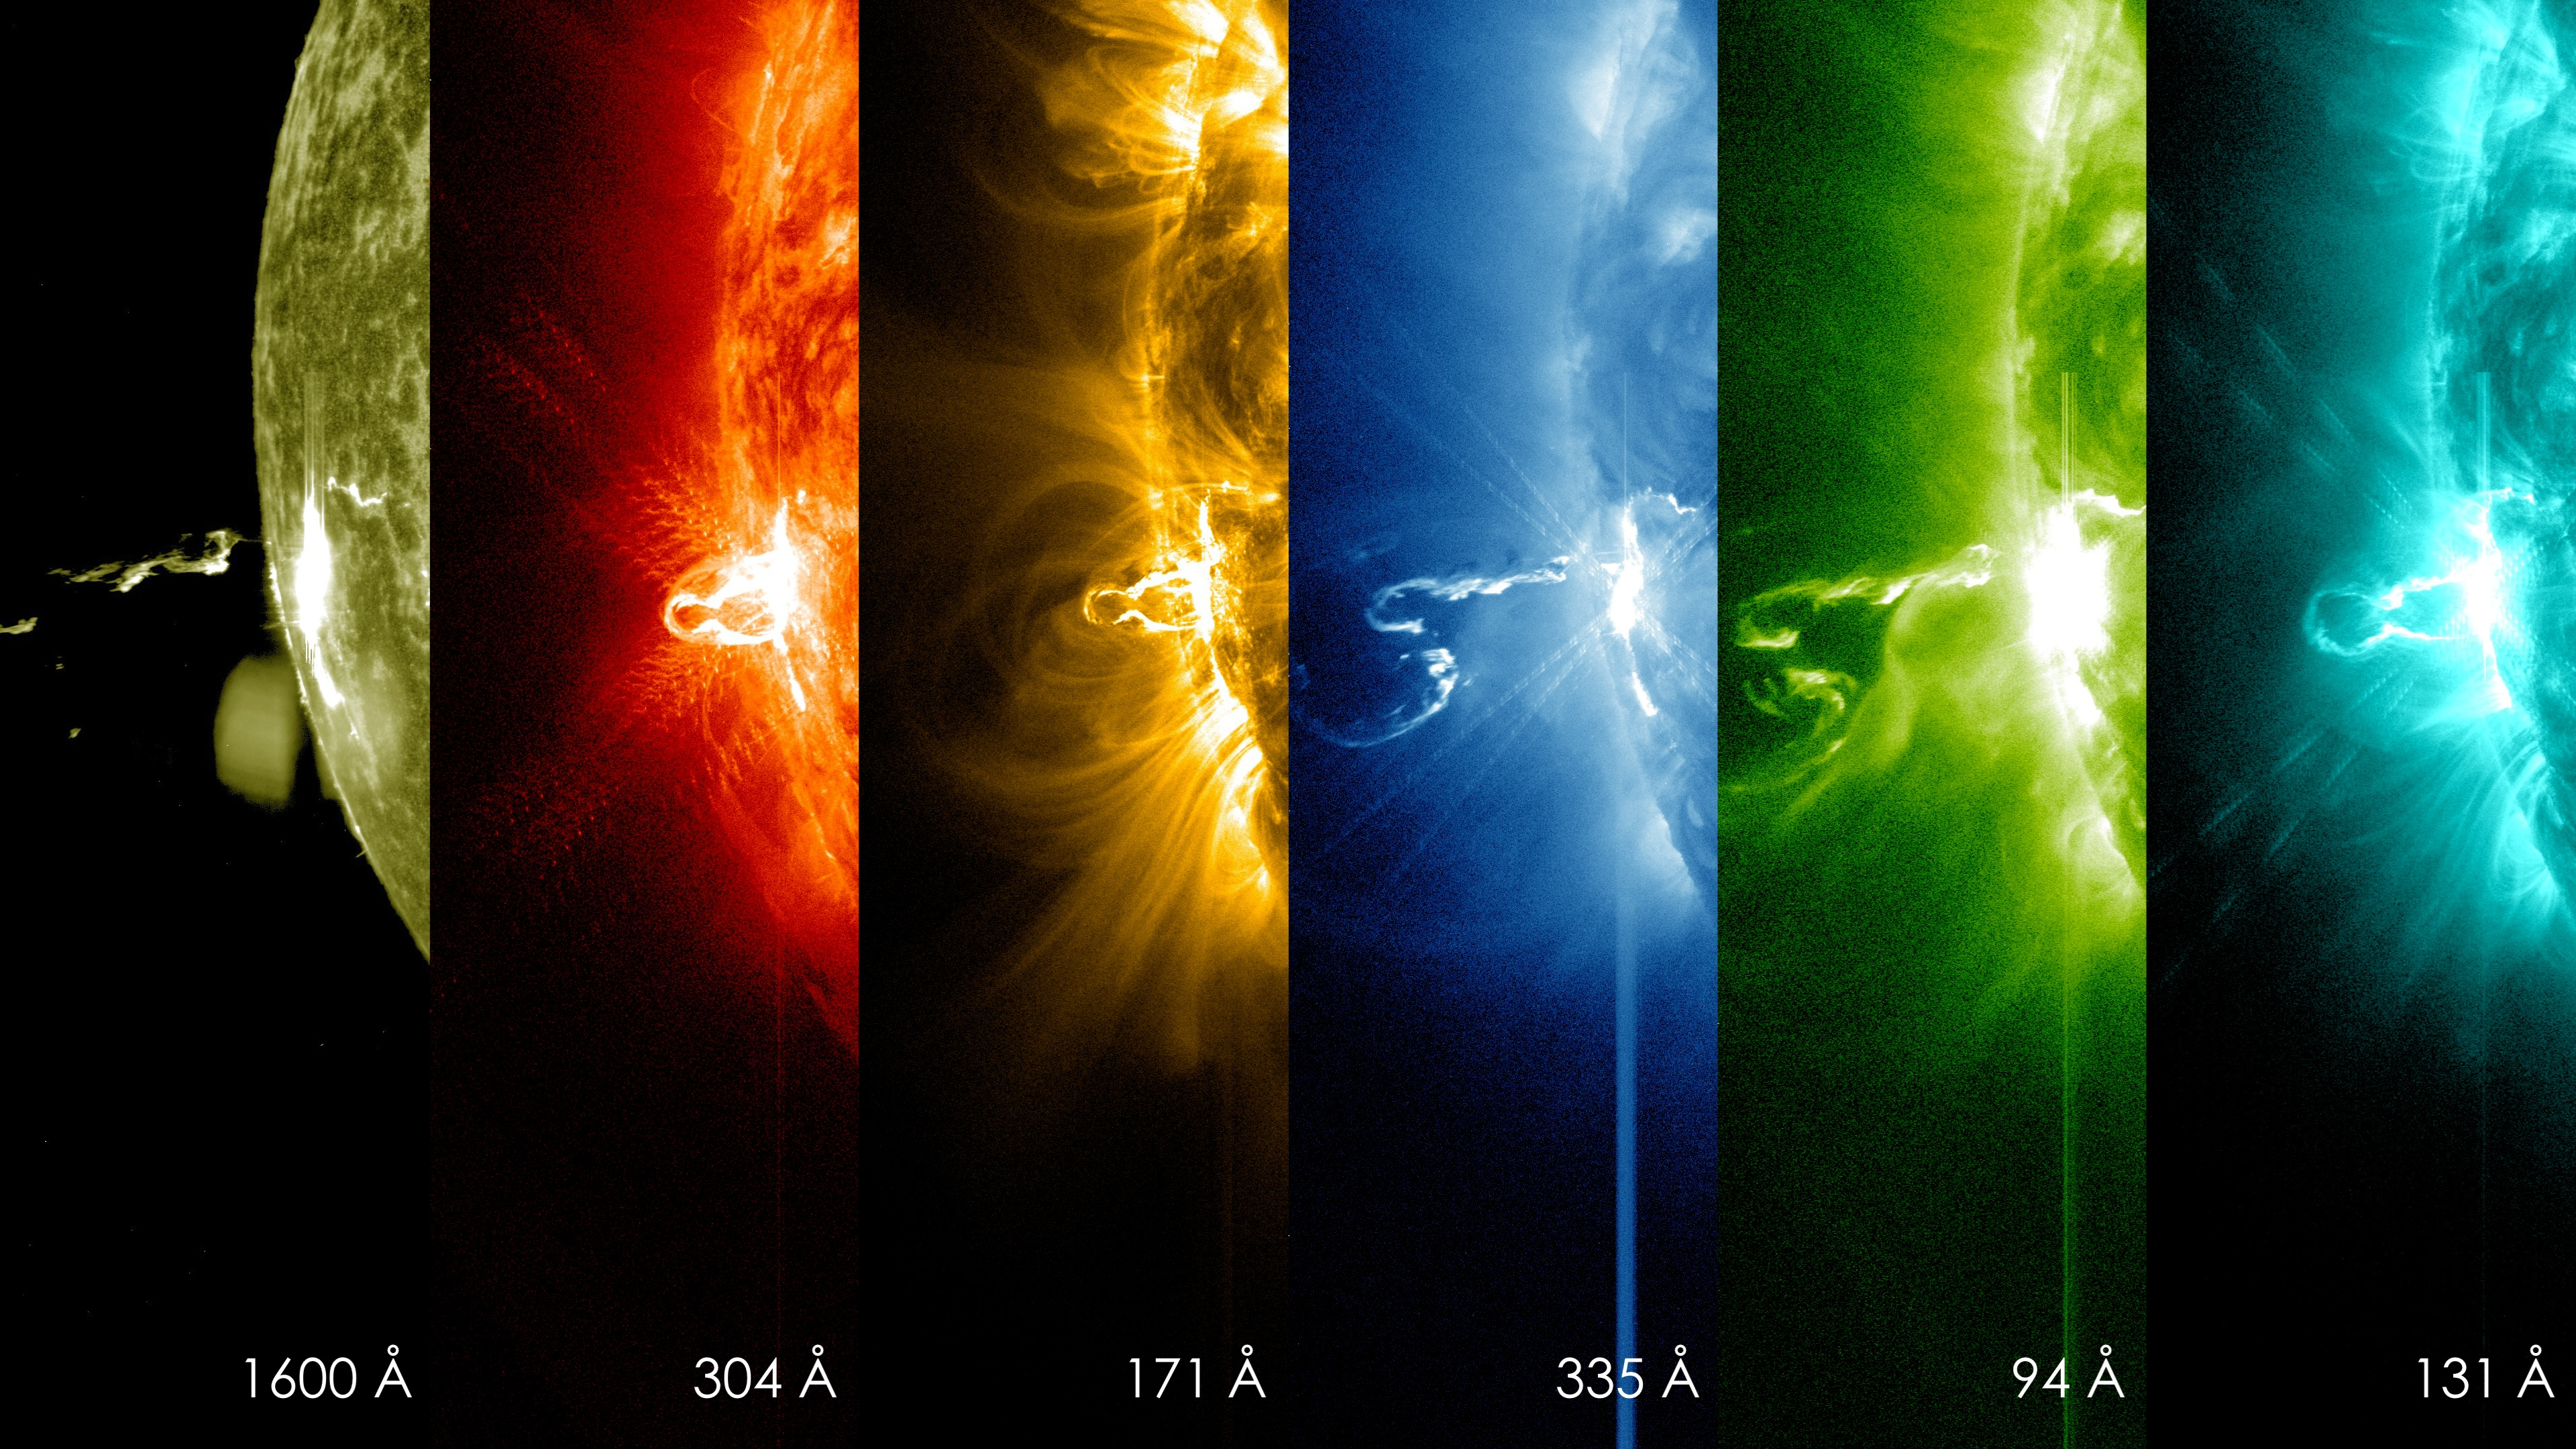 solar storm real - photo #42